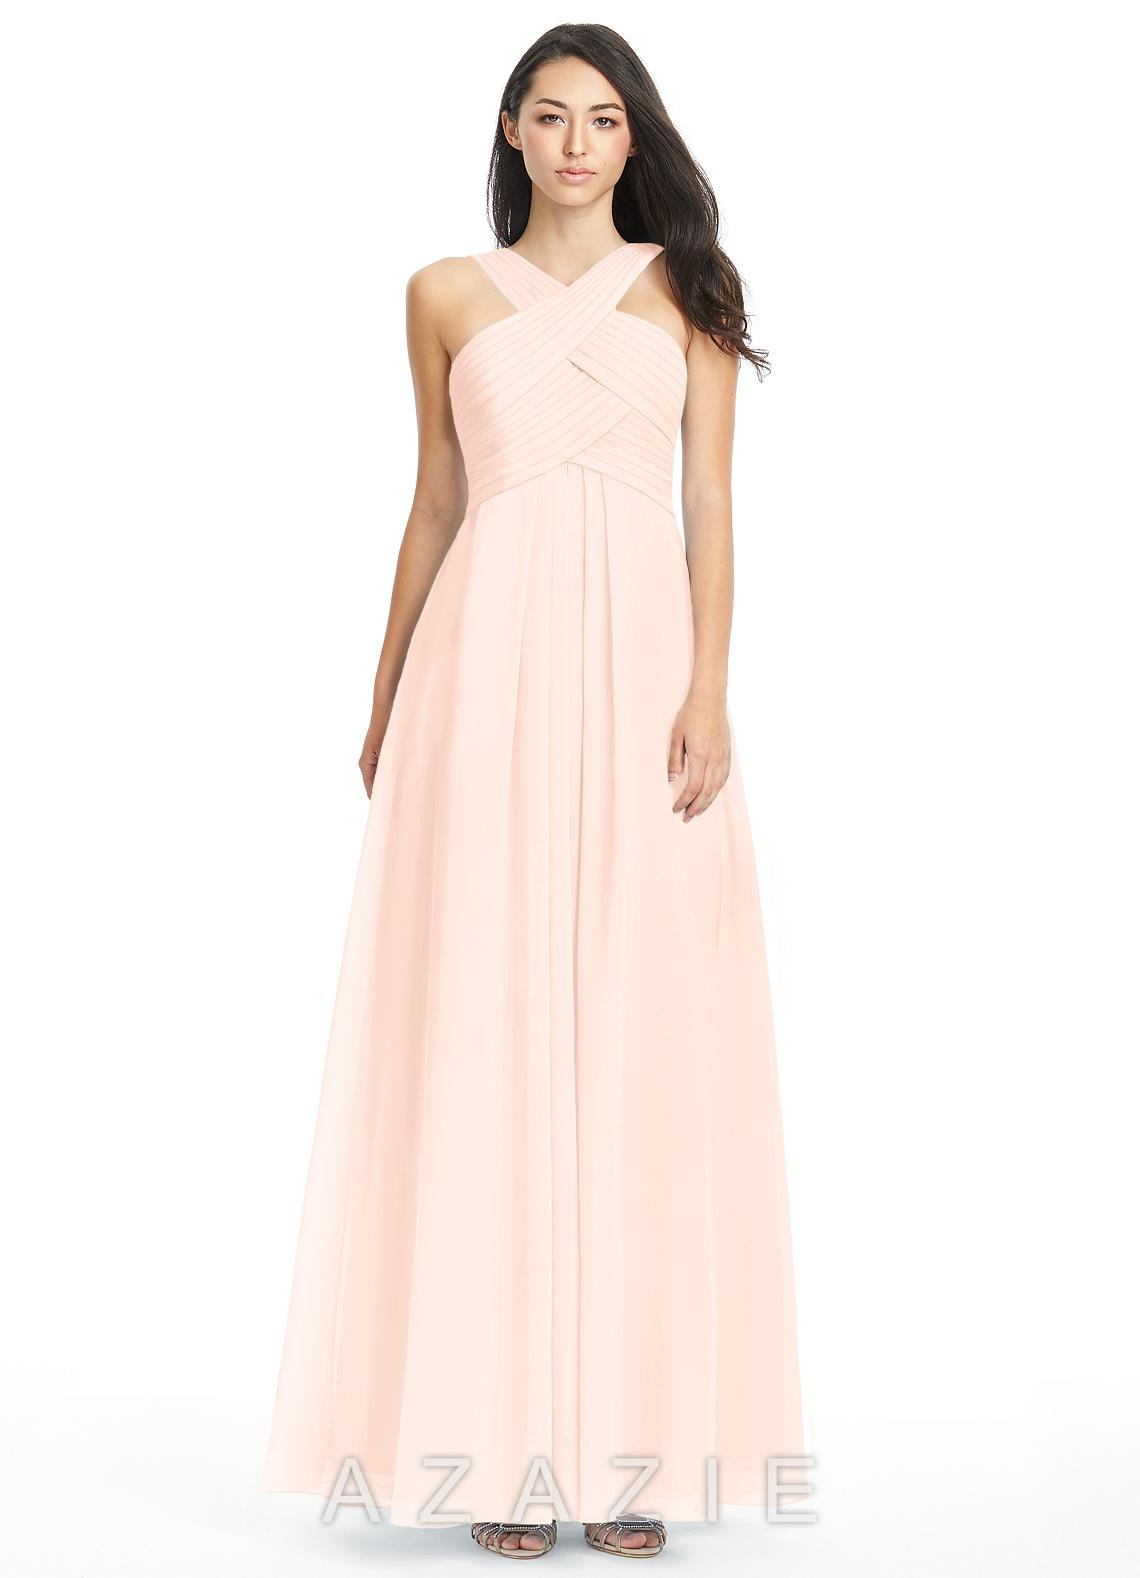 Pearl pink bridesmaid dresses pearl pink gowns azazie azazie kaleigh azazie kaleigh ombrellifo Choice Image